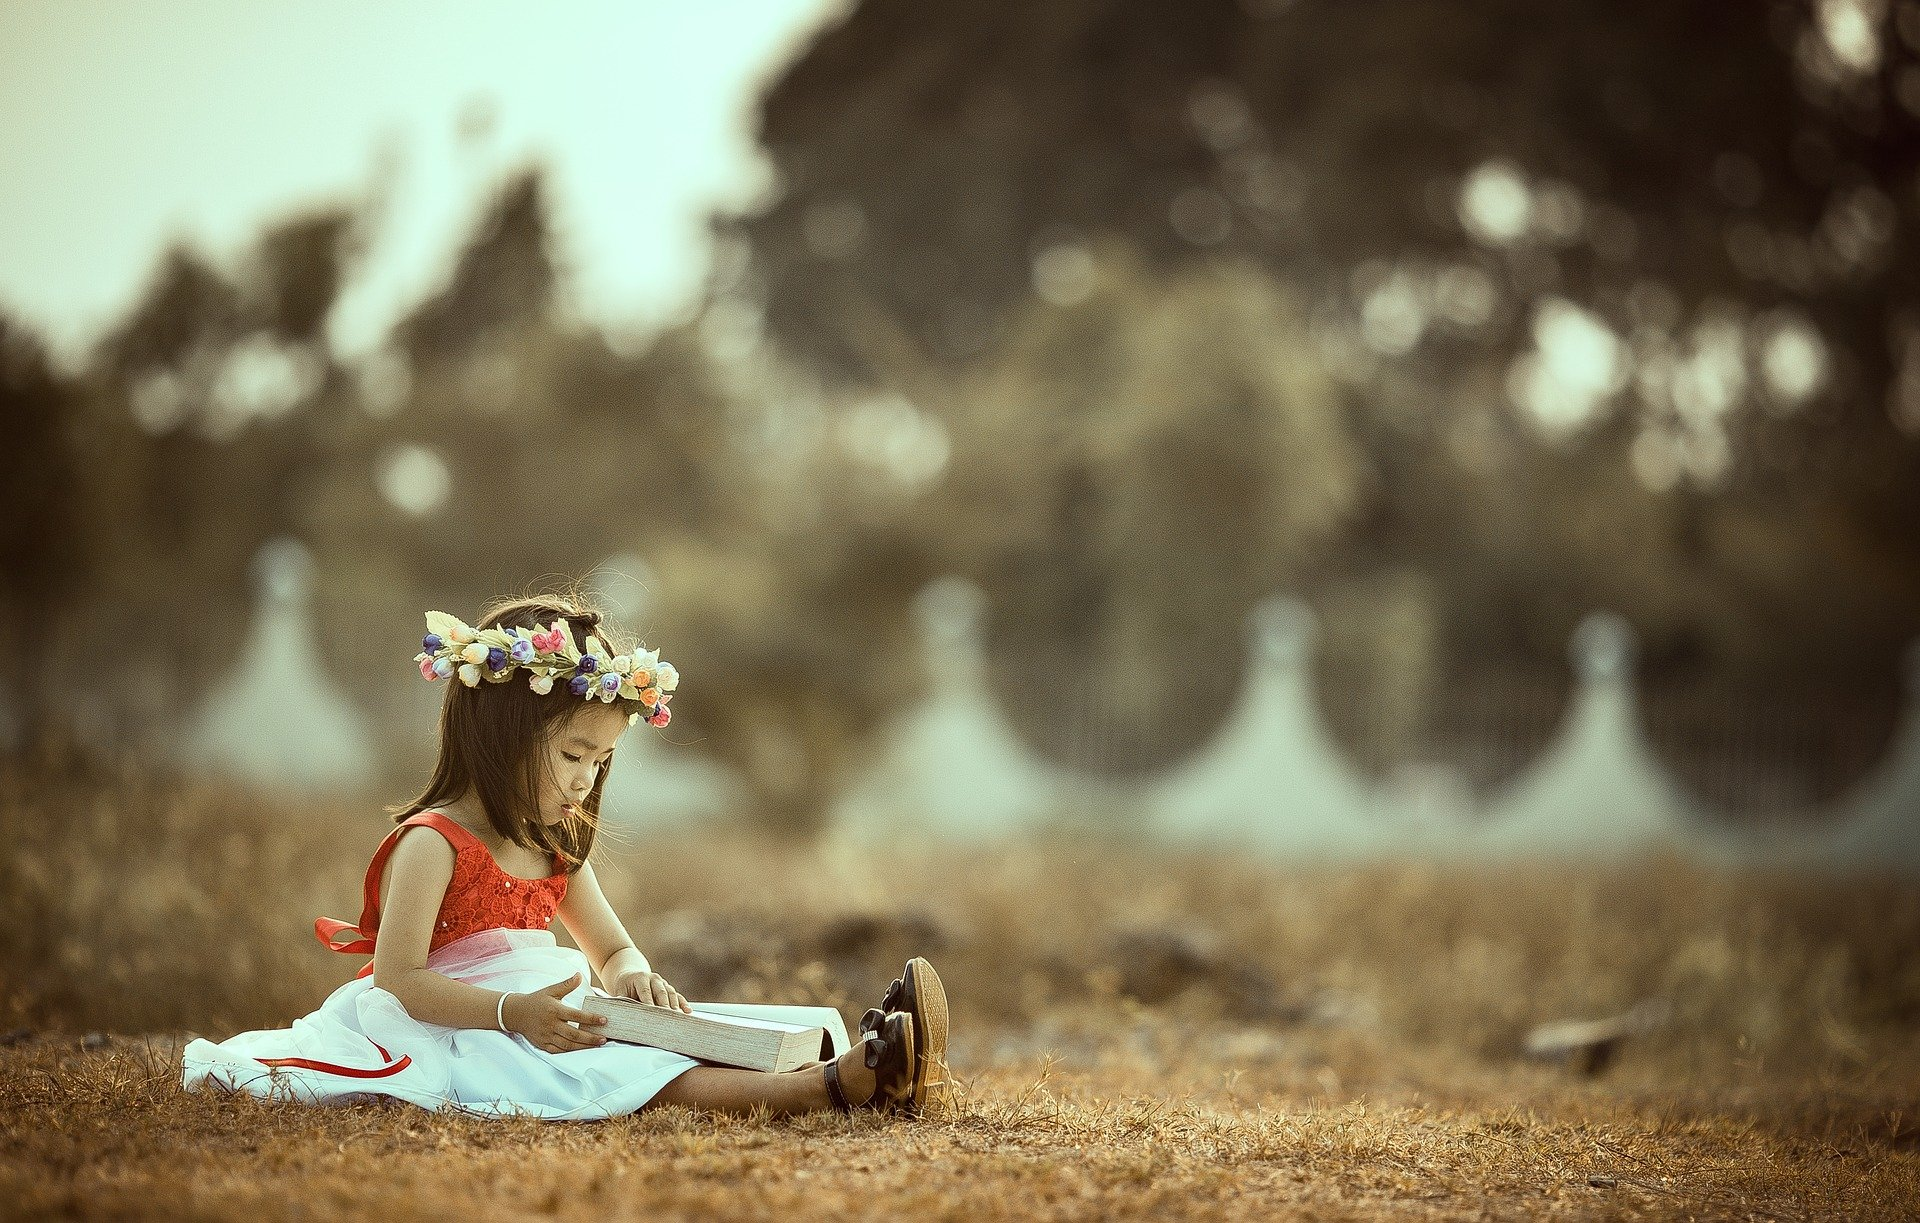 Child sitting on the ground reading.